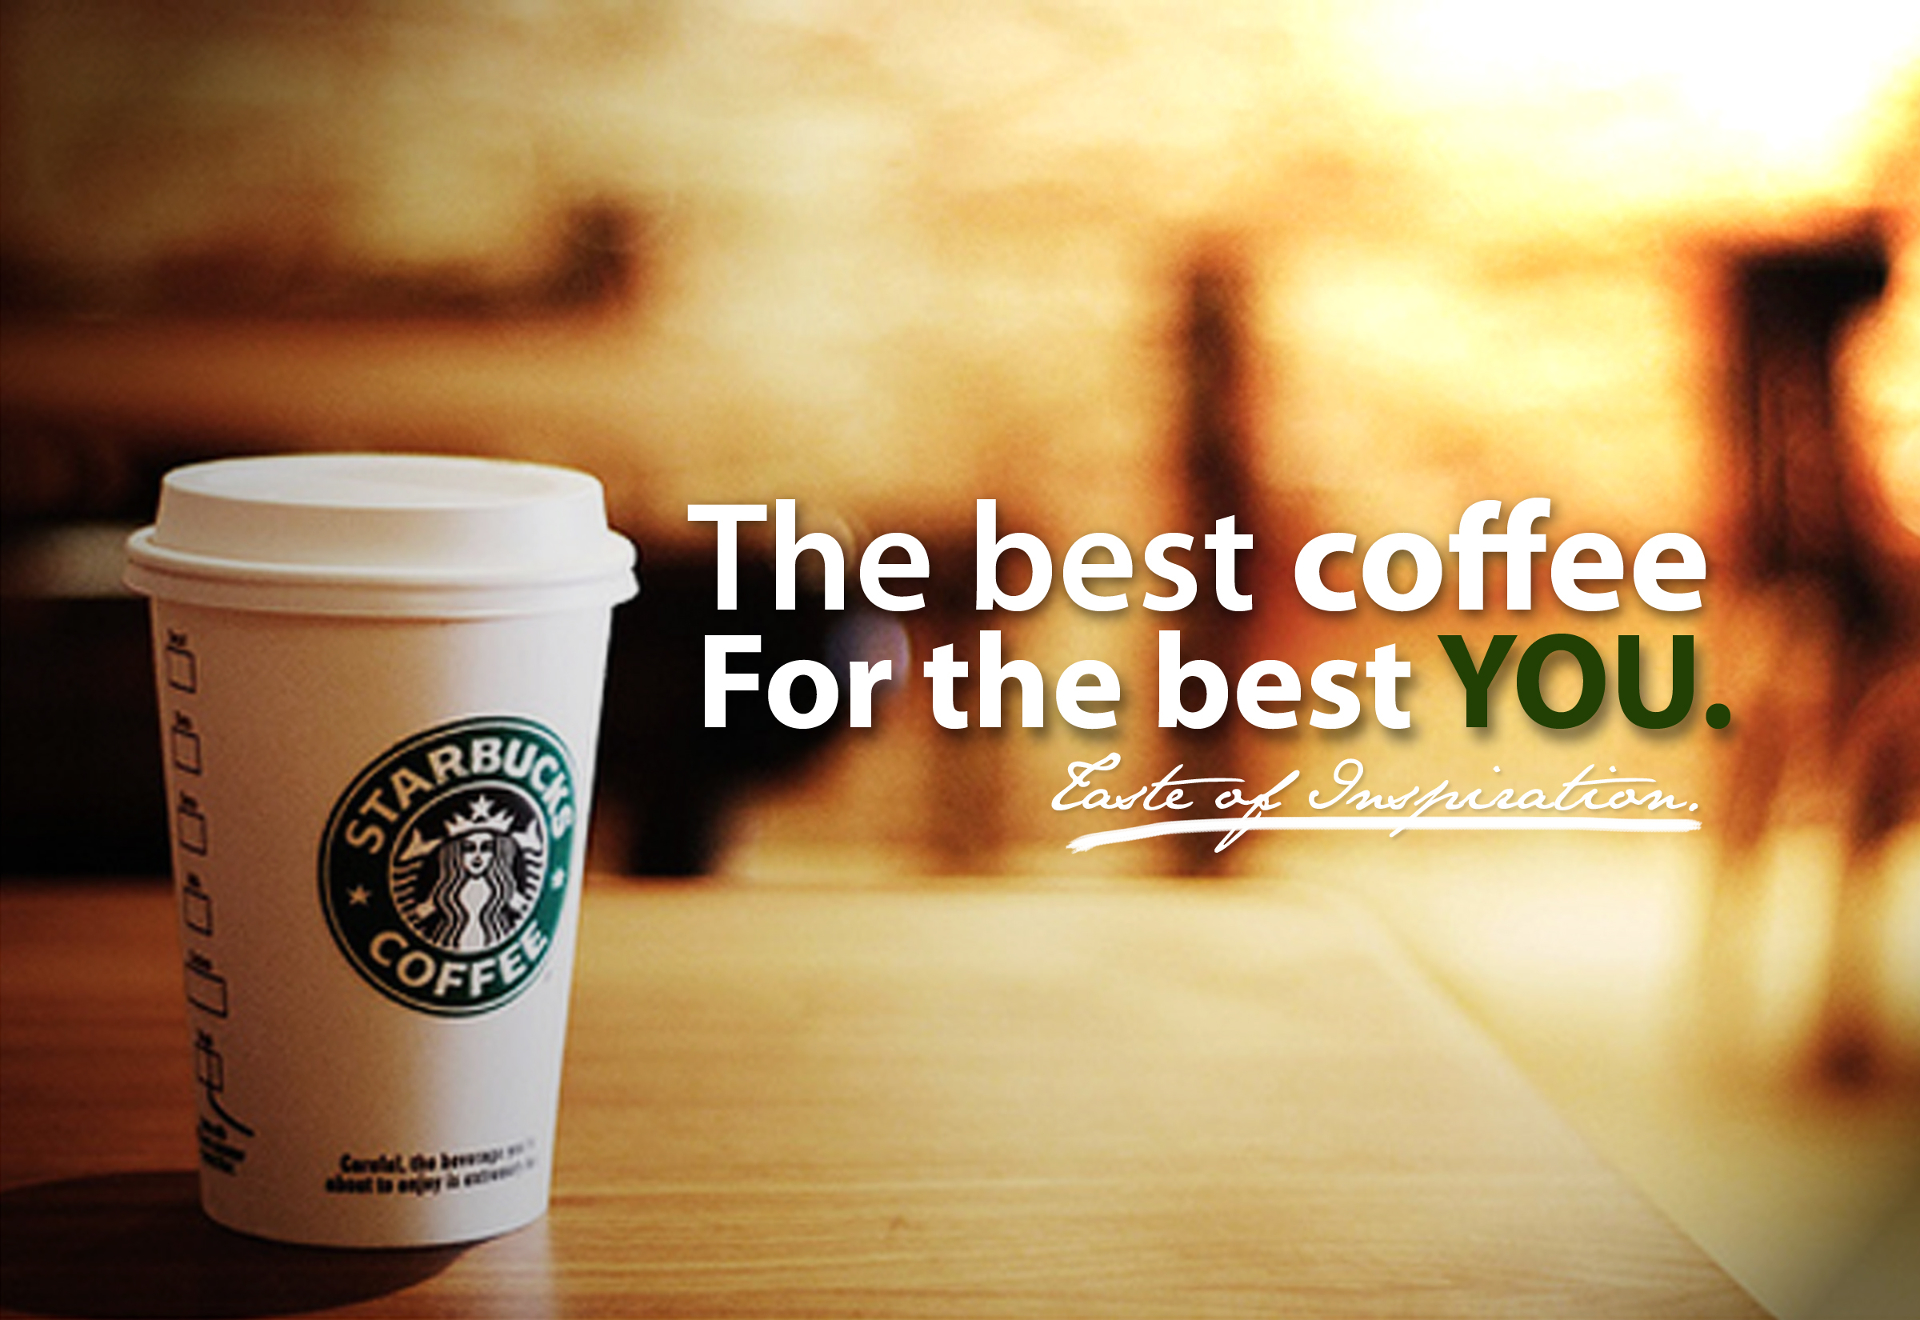 Starbucks Fondo De Pantalla Hd Fondo De Escritorio